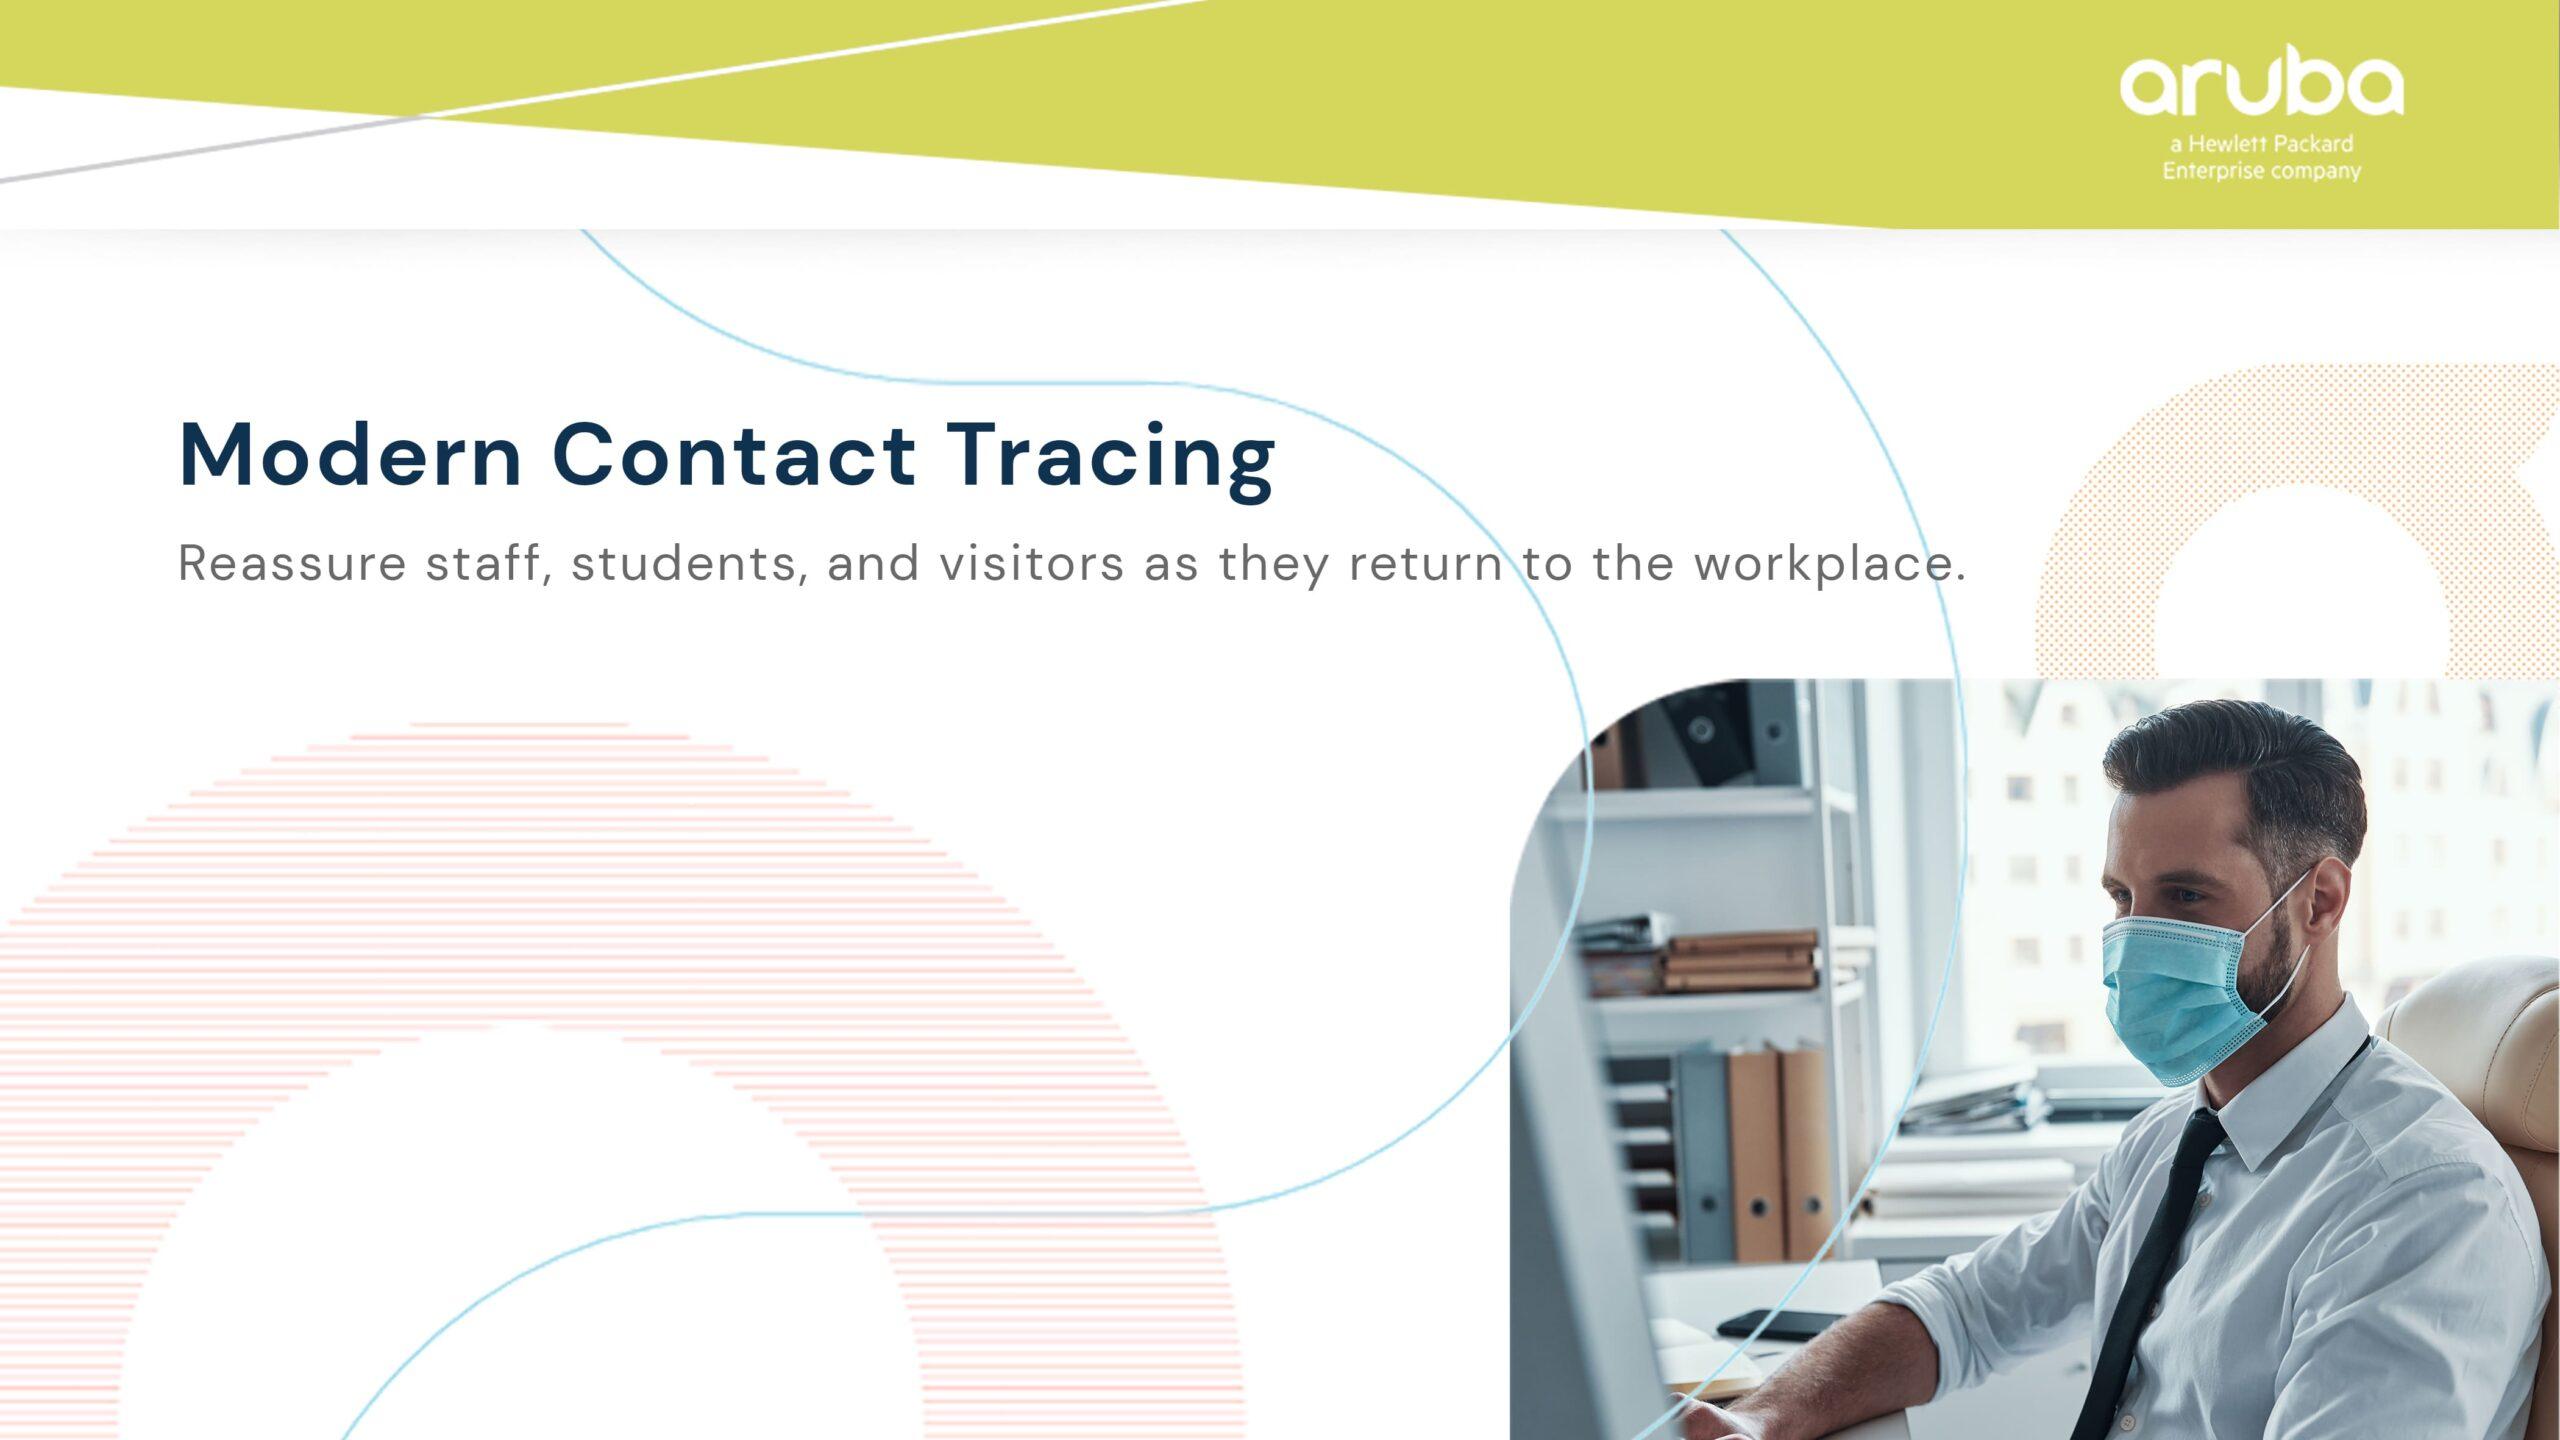 Aruba Contact Tracing